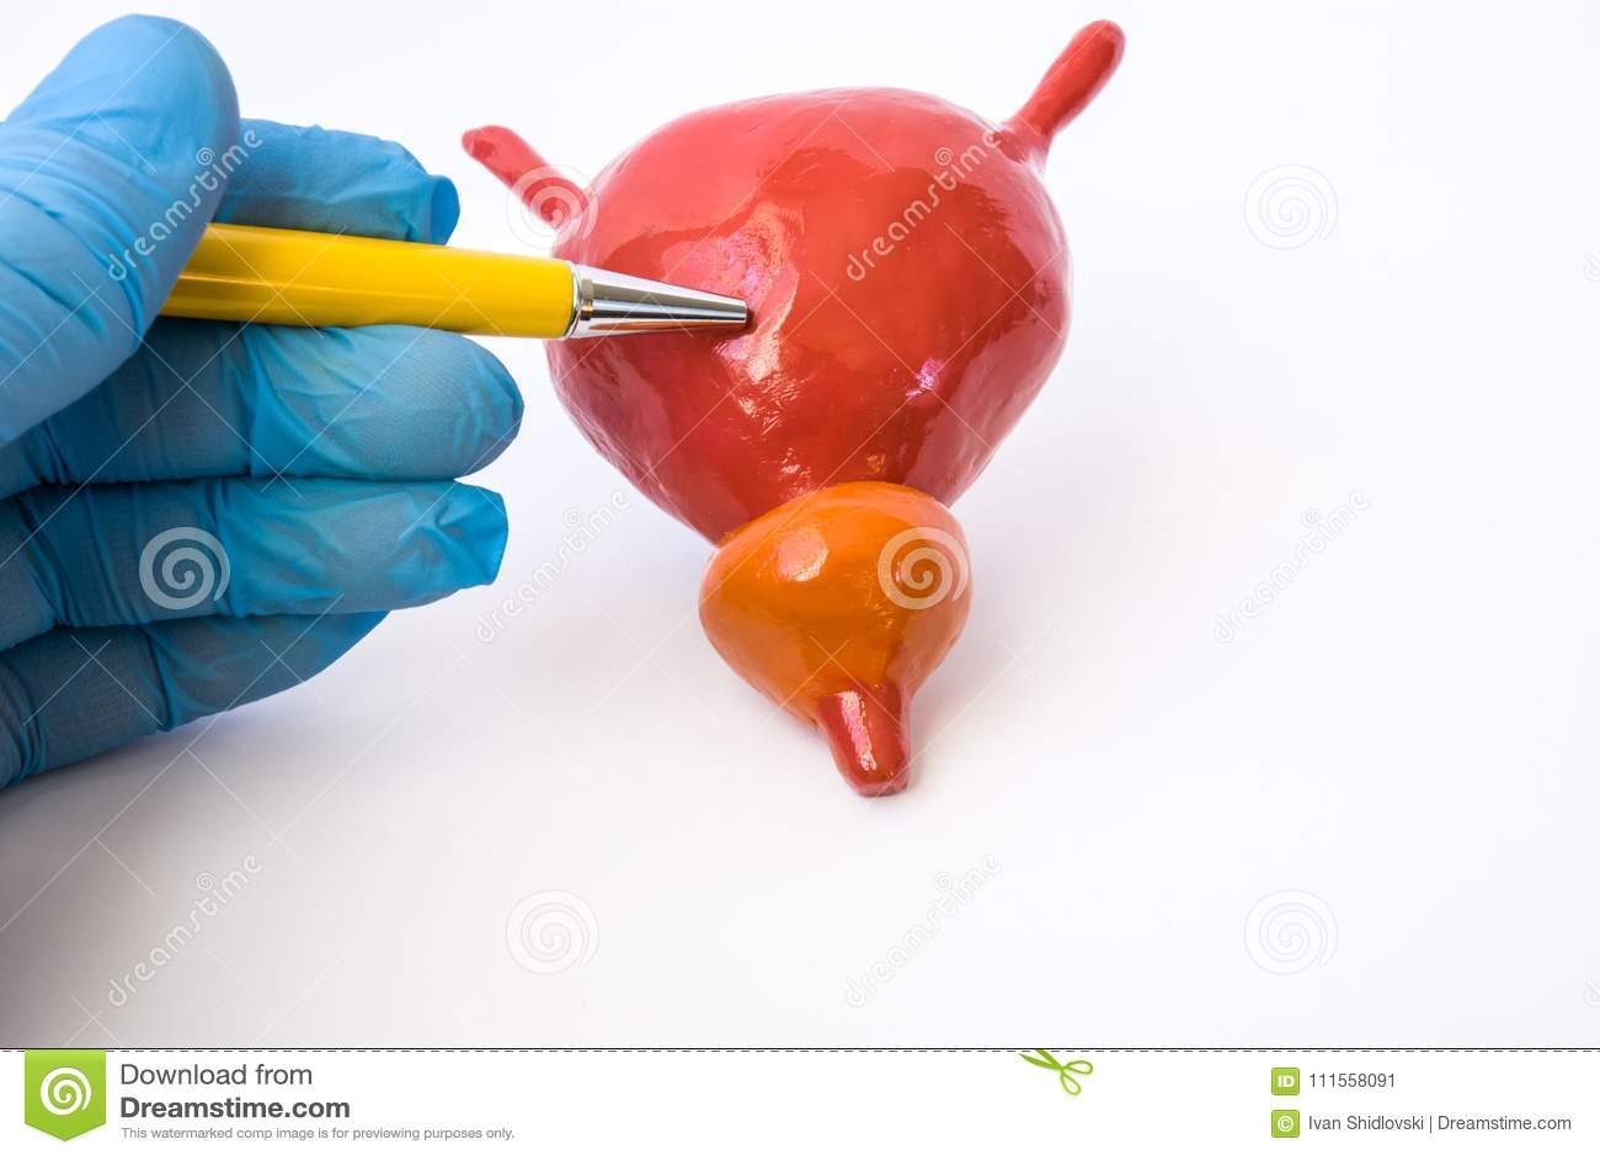 Anatomie Der Prostata Stock Photos - 19 Images